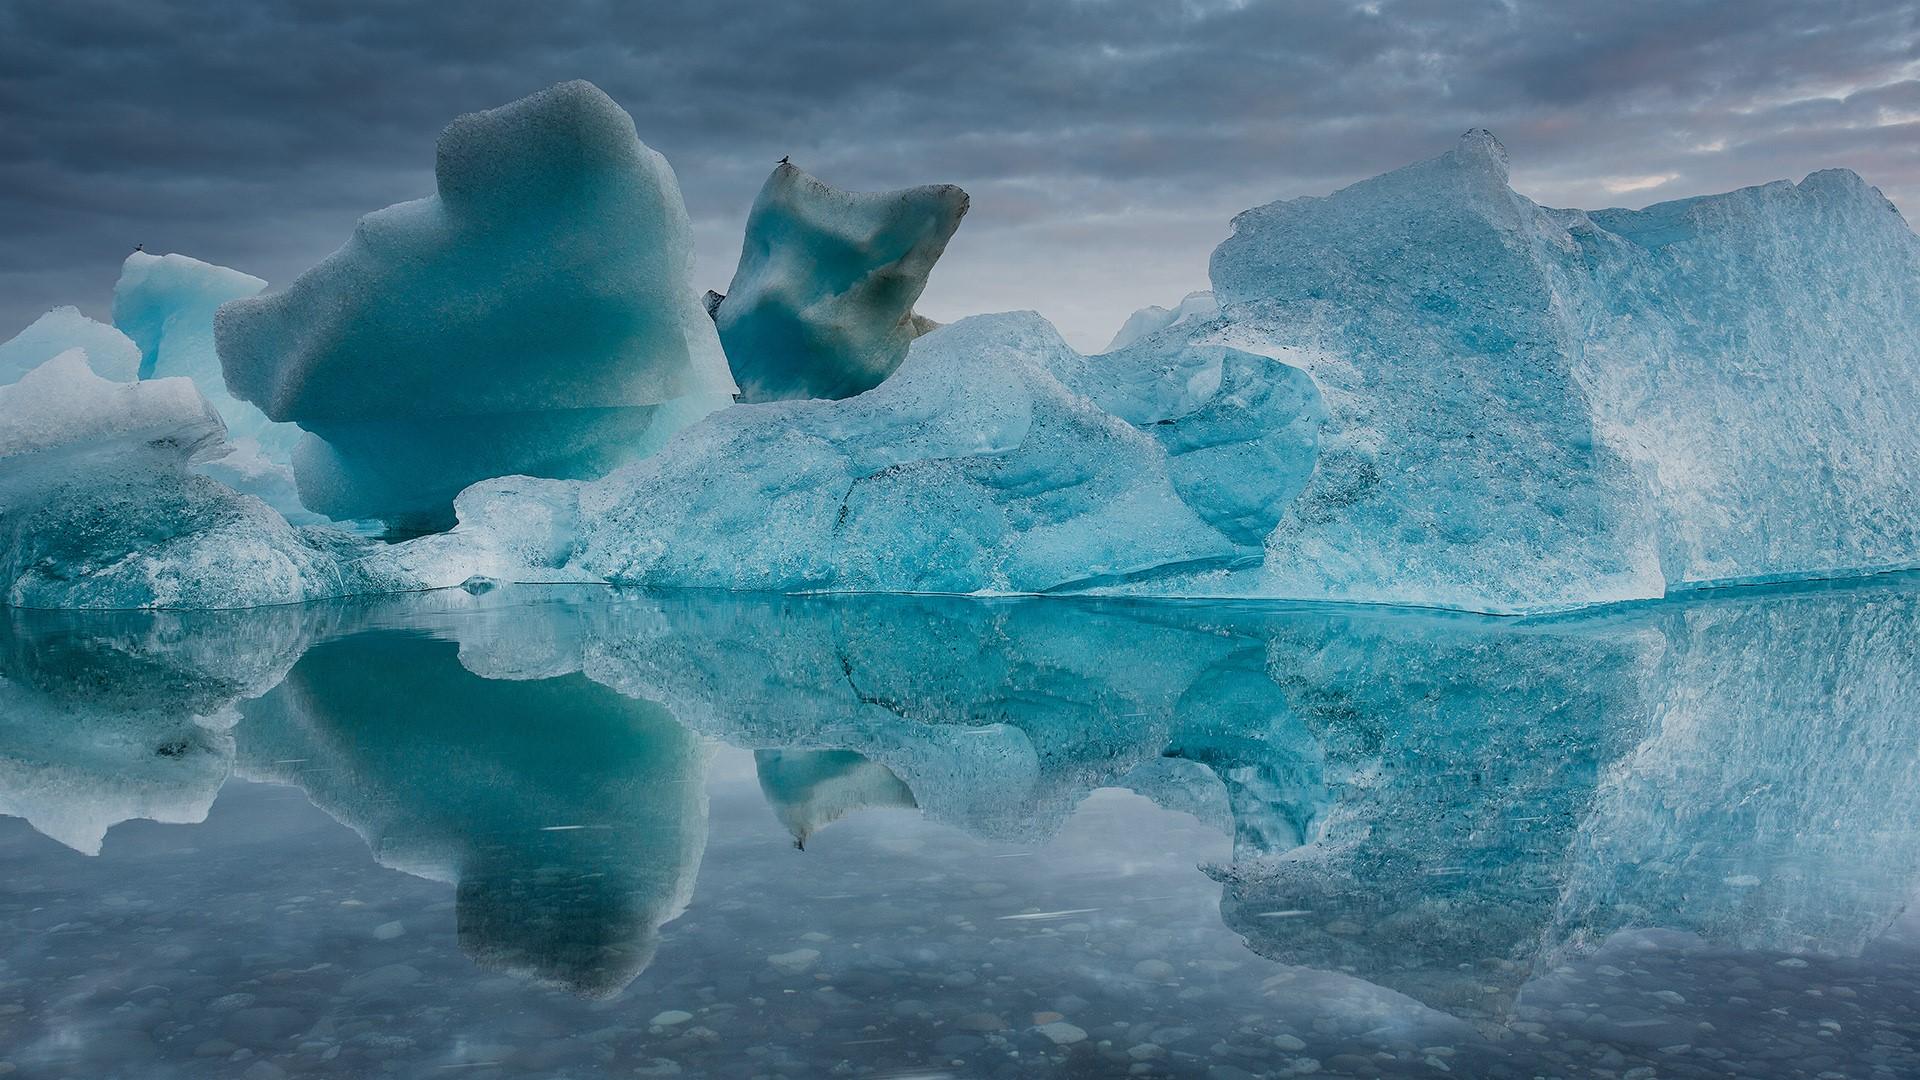 Wallpaper 1920x1080 Px Ice Iceberg Landscape Nature